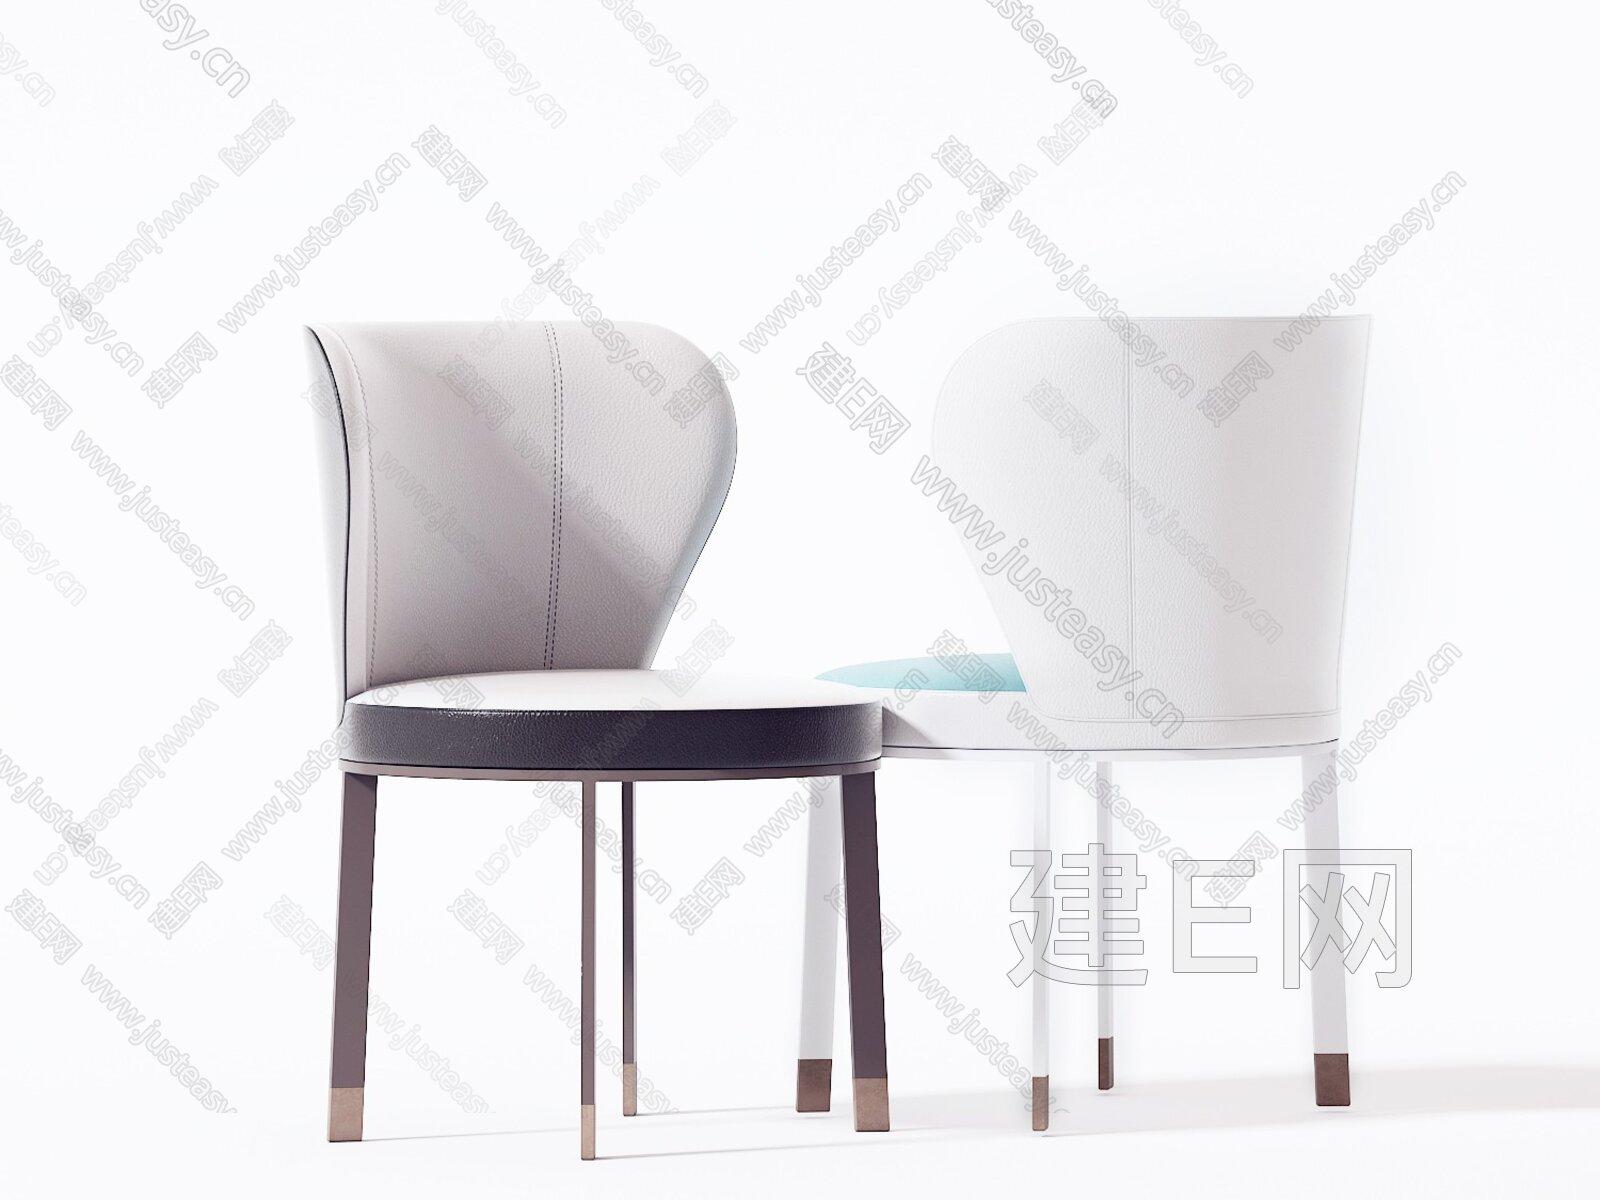 Chi Wing Lo 新中式单椅3d模型